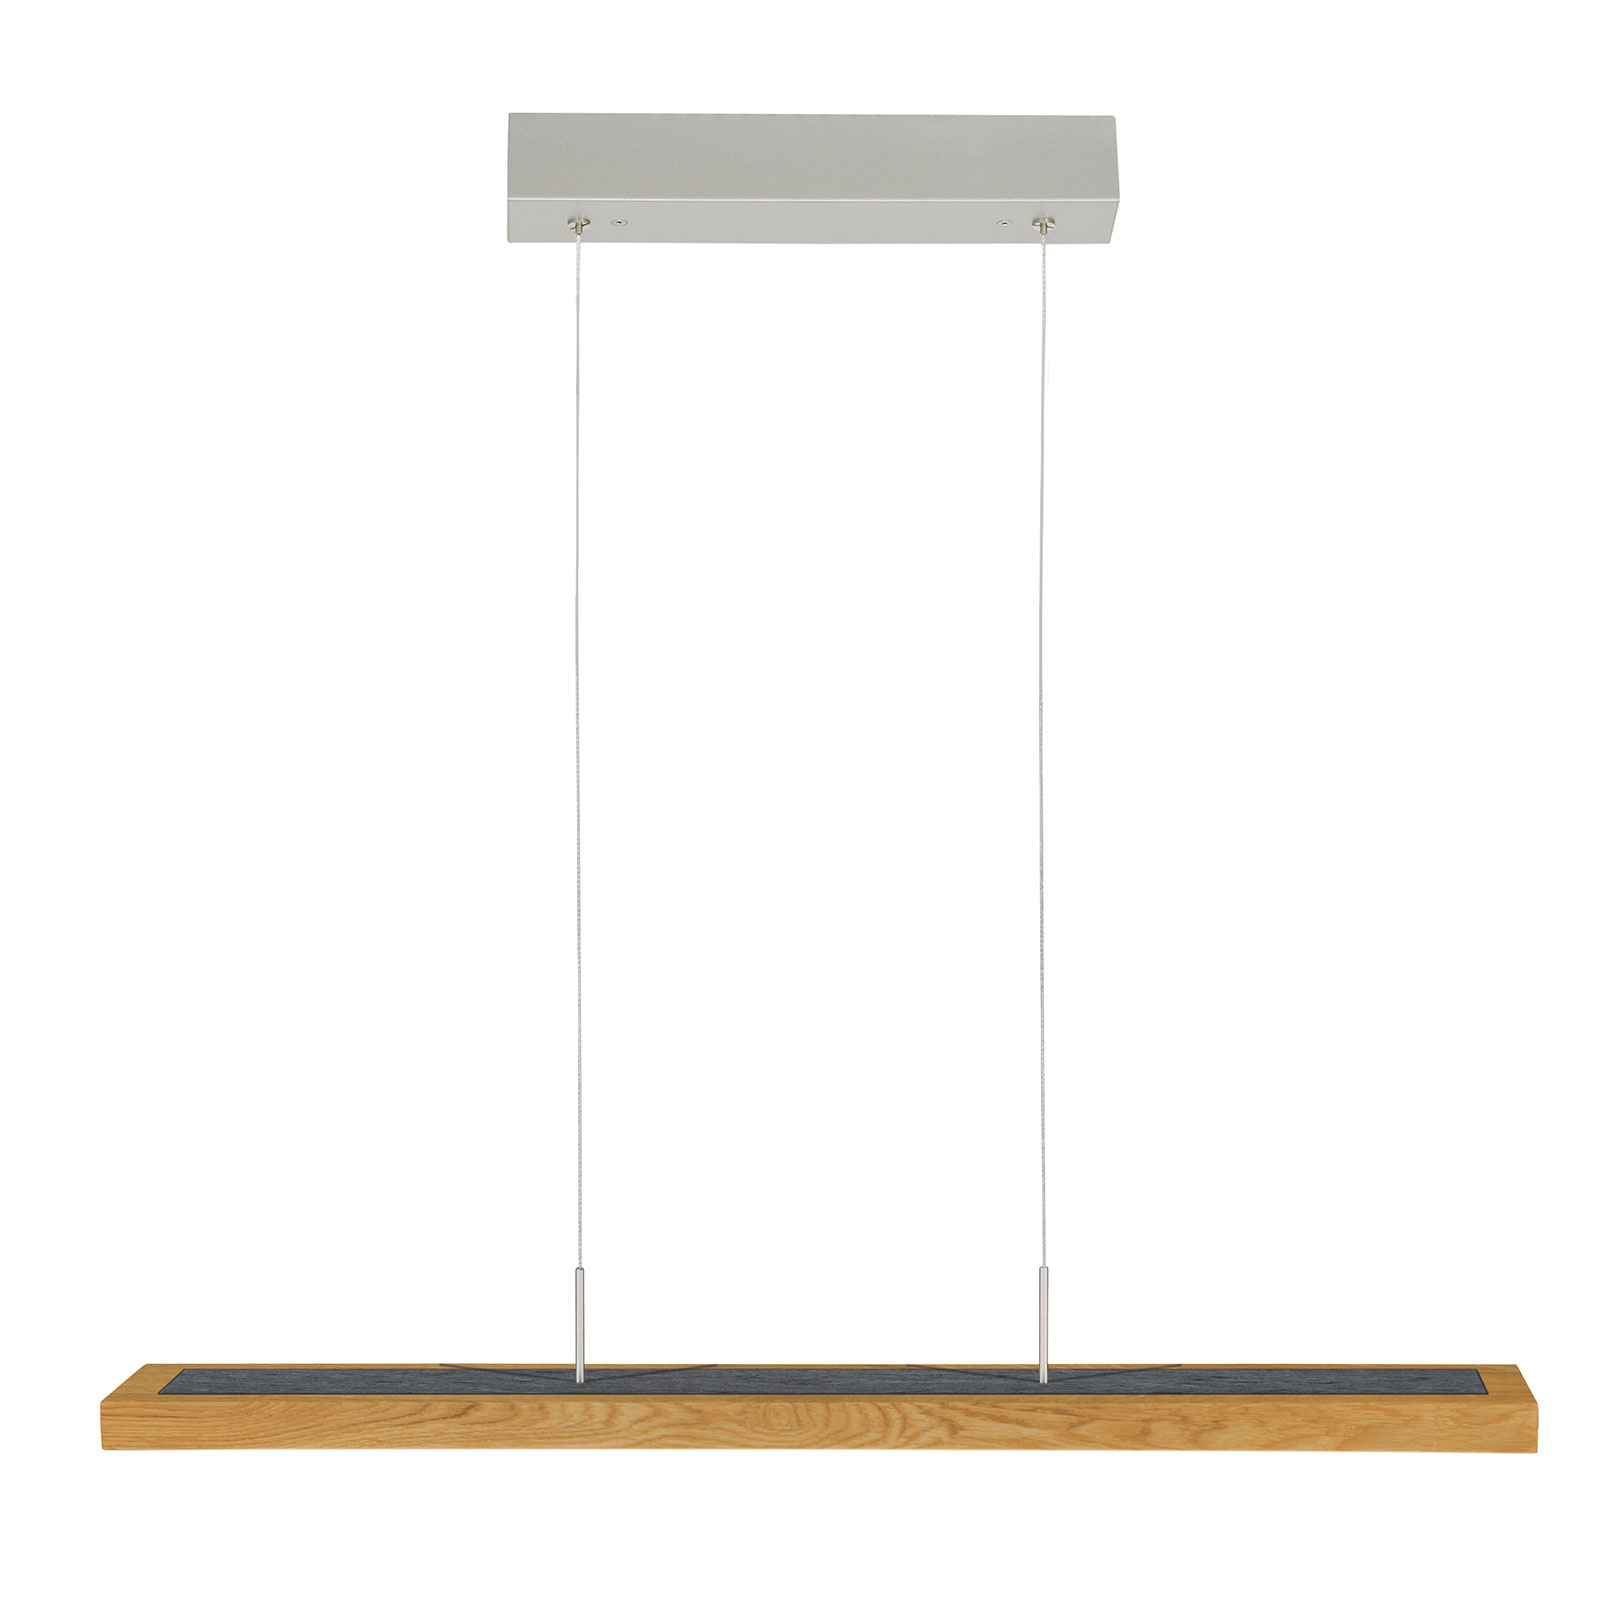 HerzBlut Dana lampada a sospensione rovere 90cm